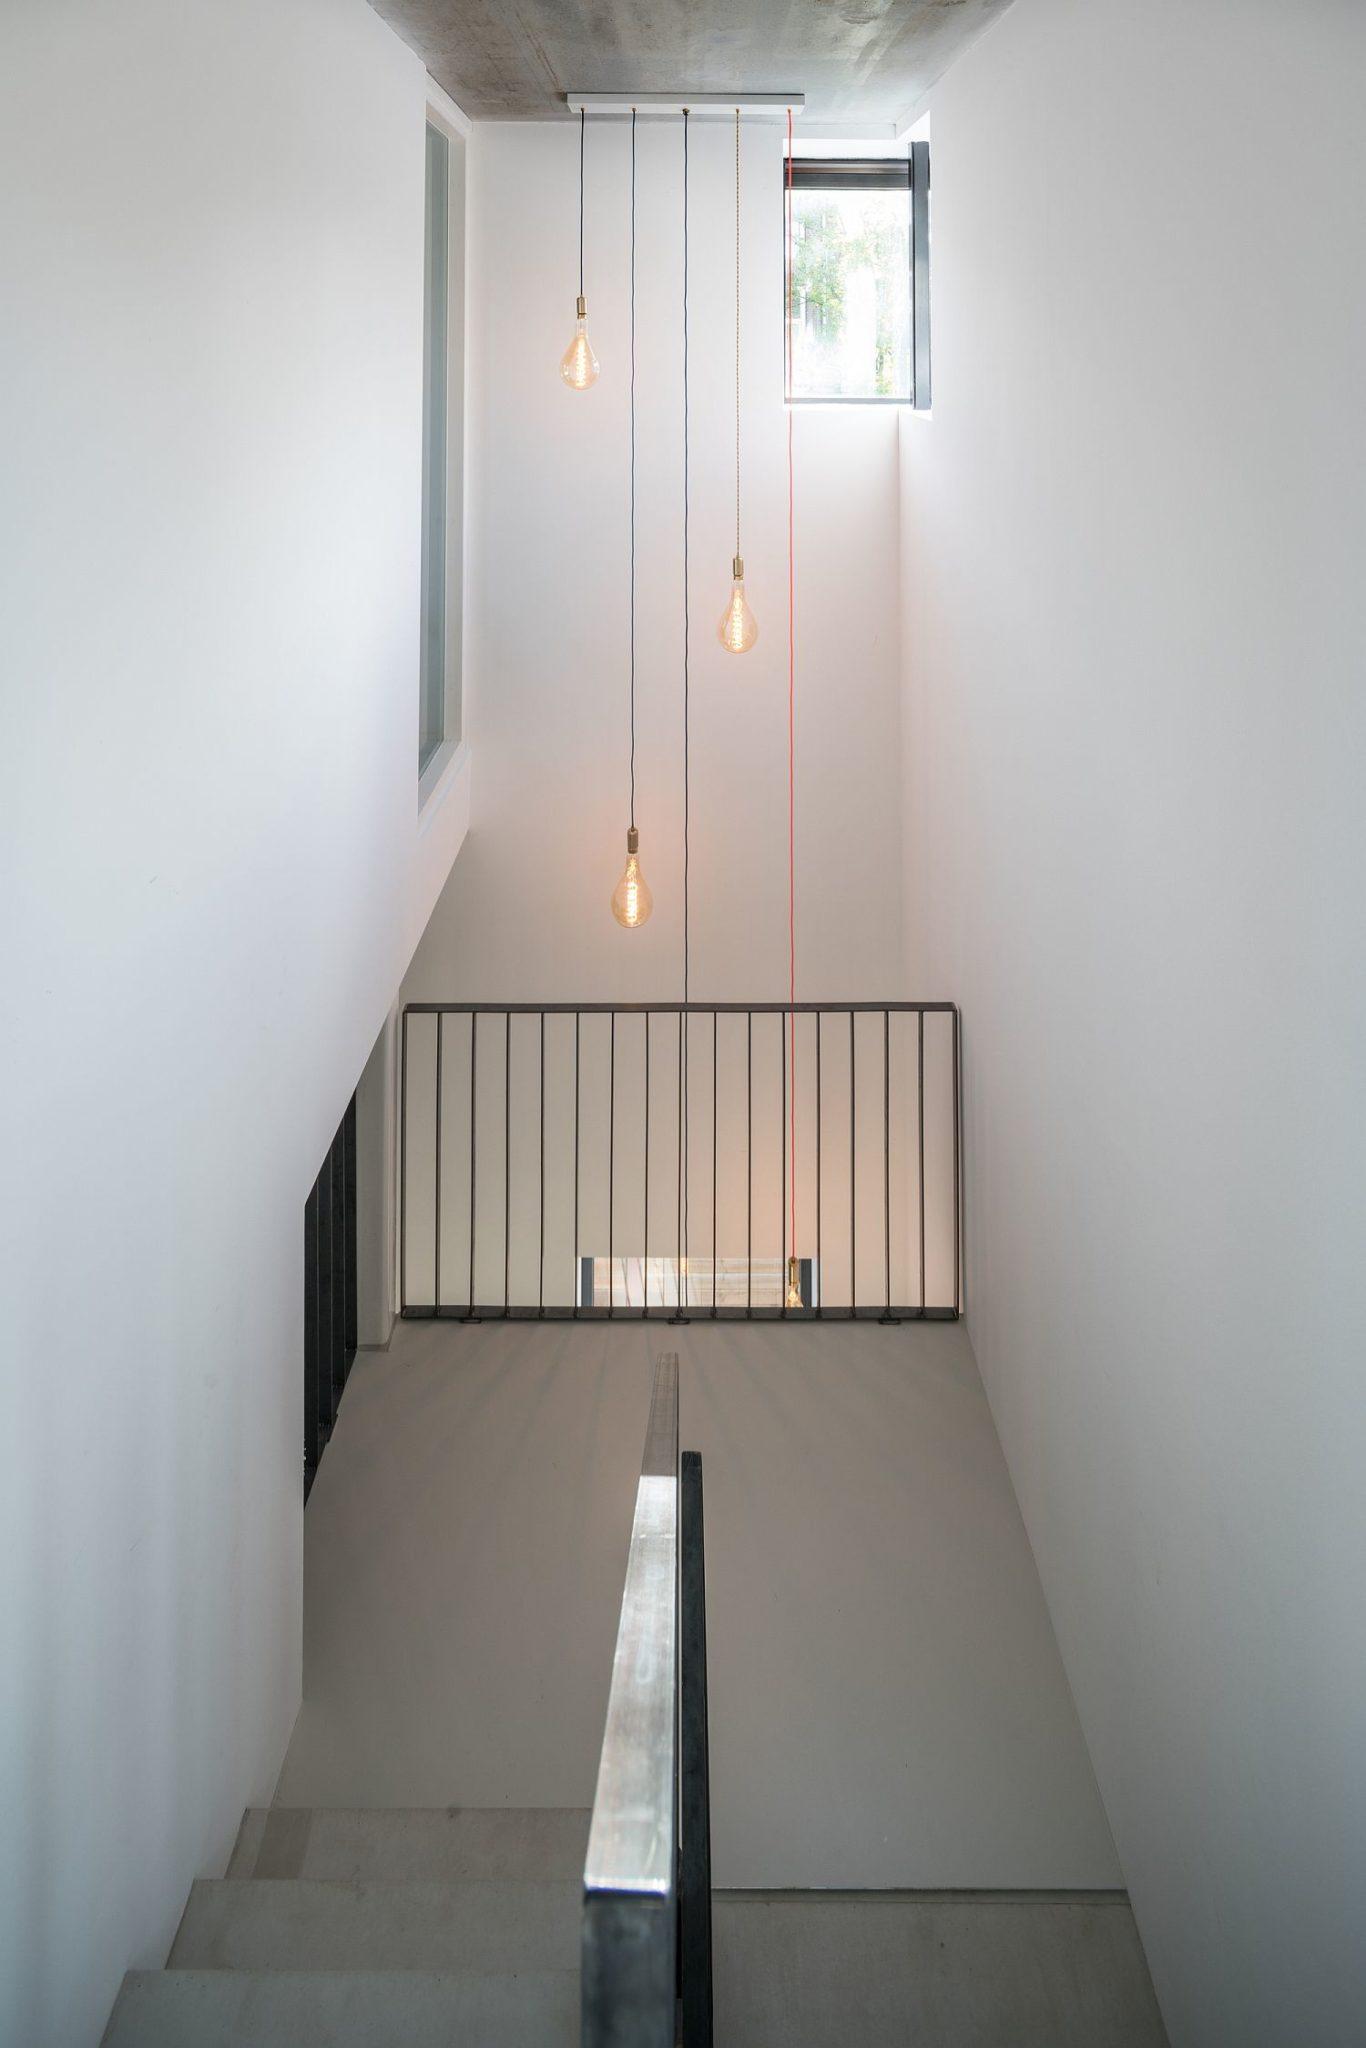 Edison-bulb-lighting-illuminating-the-stairway